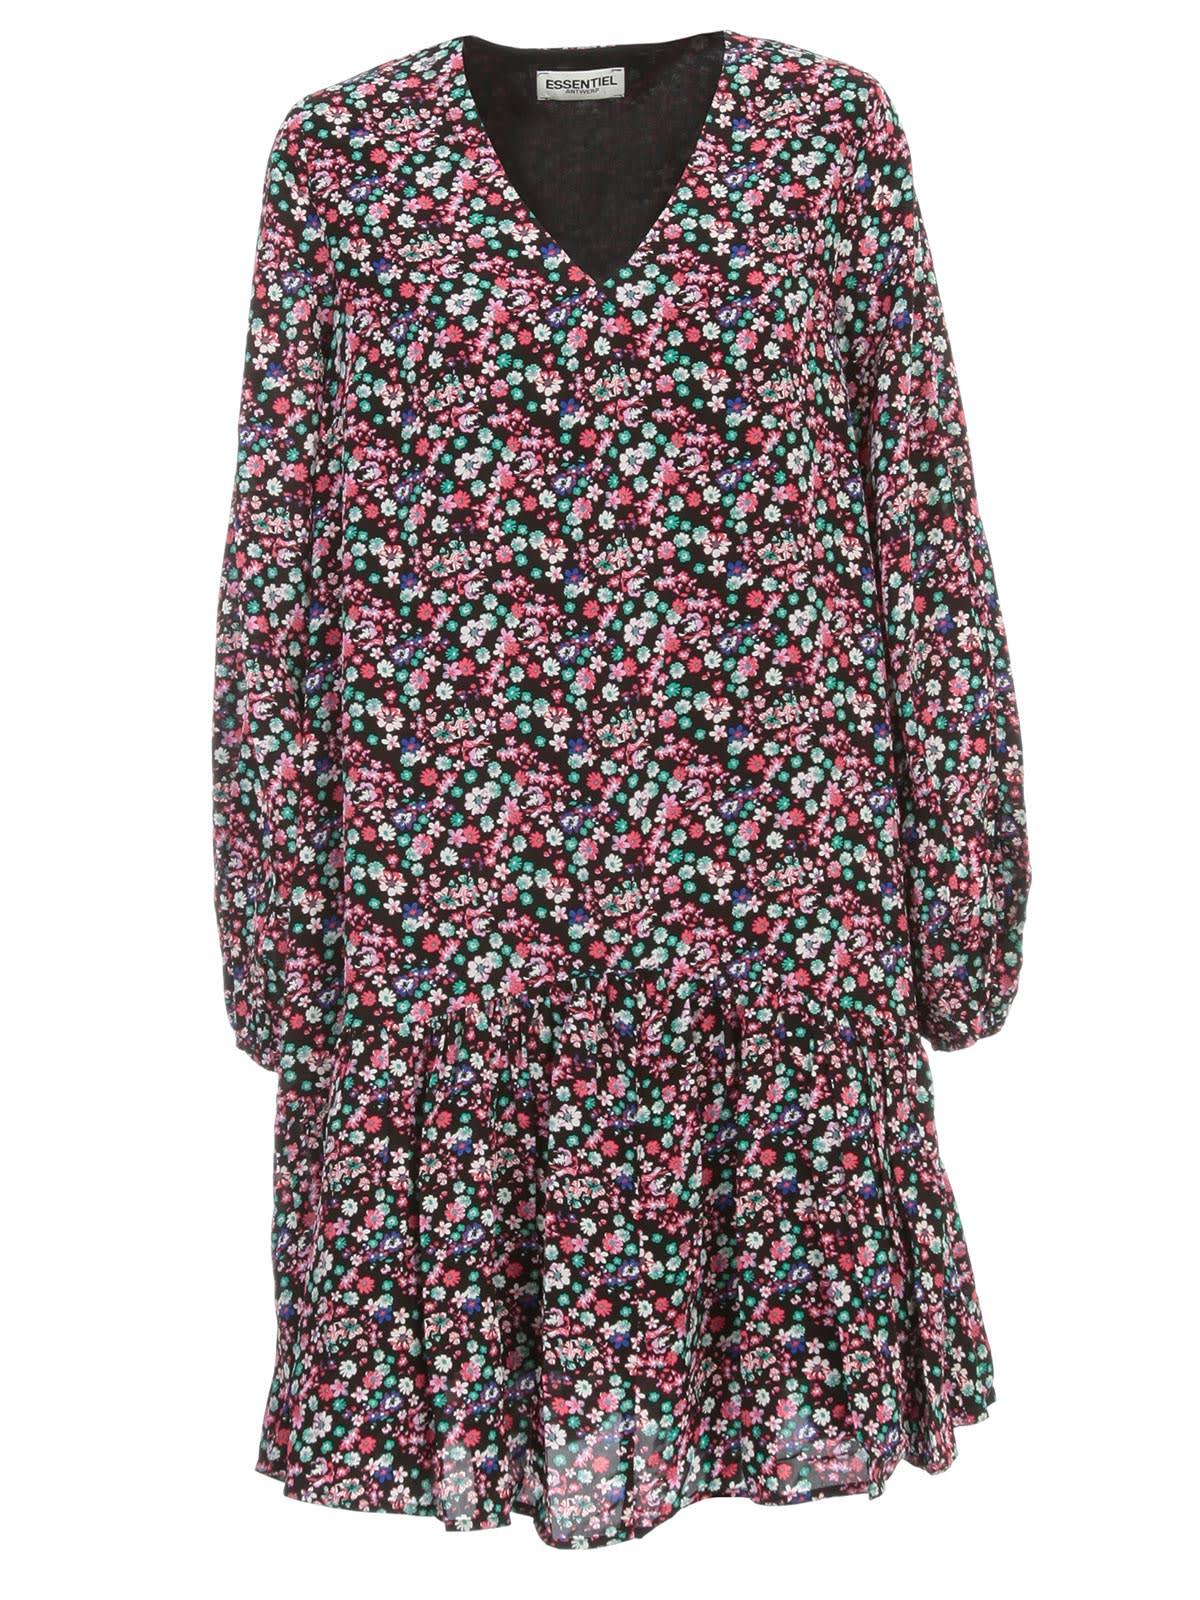 Buy Essentiel Antwerp Verci V Neck Flounced Dress L/s online, shop Essentiel Antwerp with free shipping